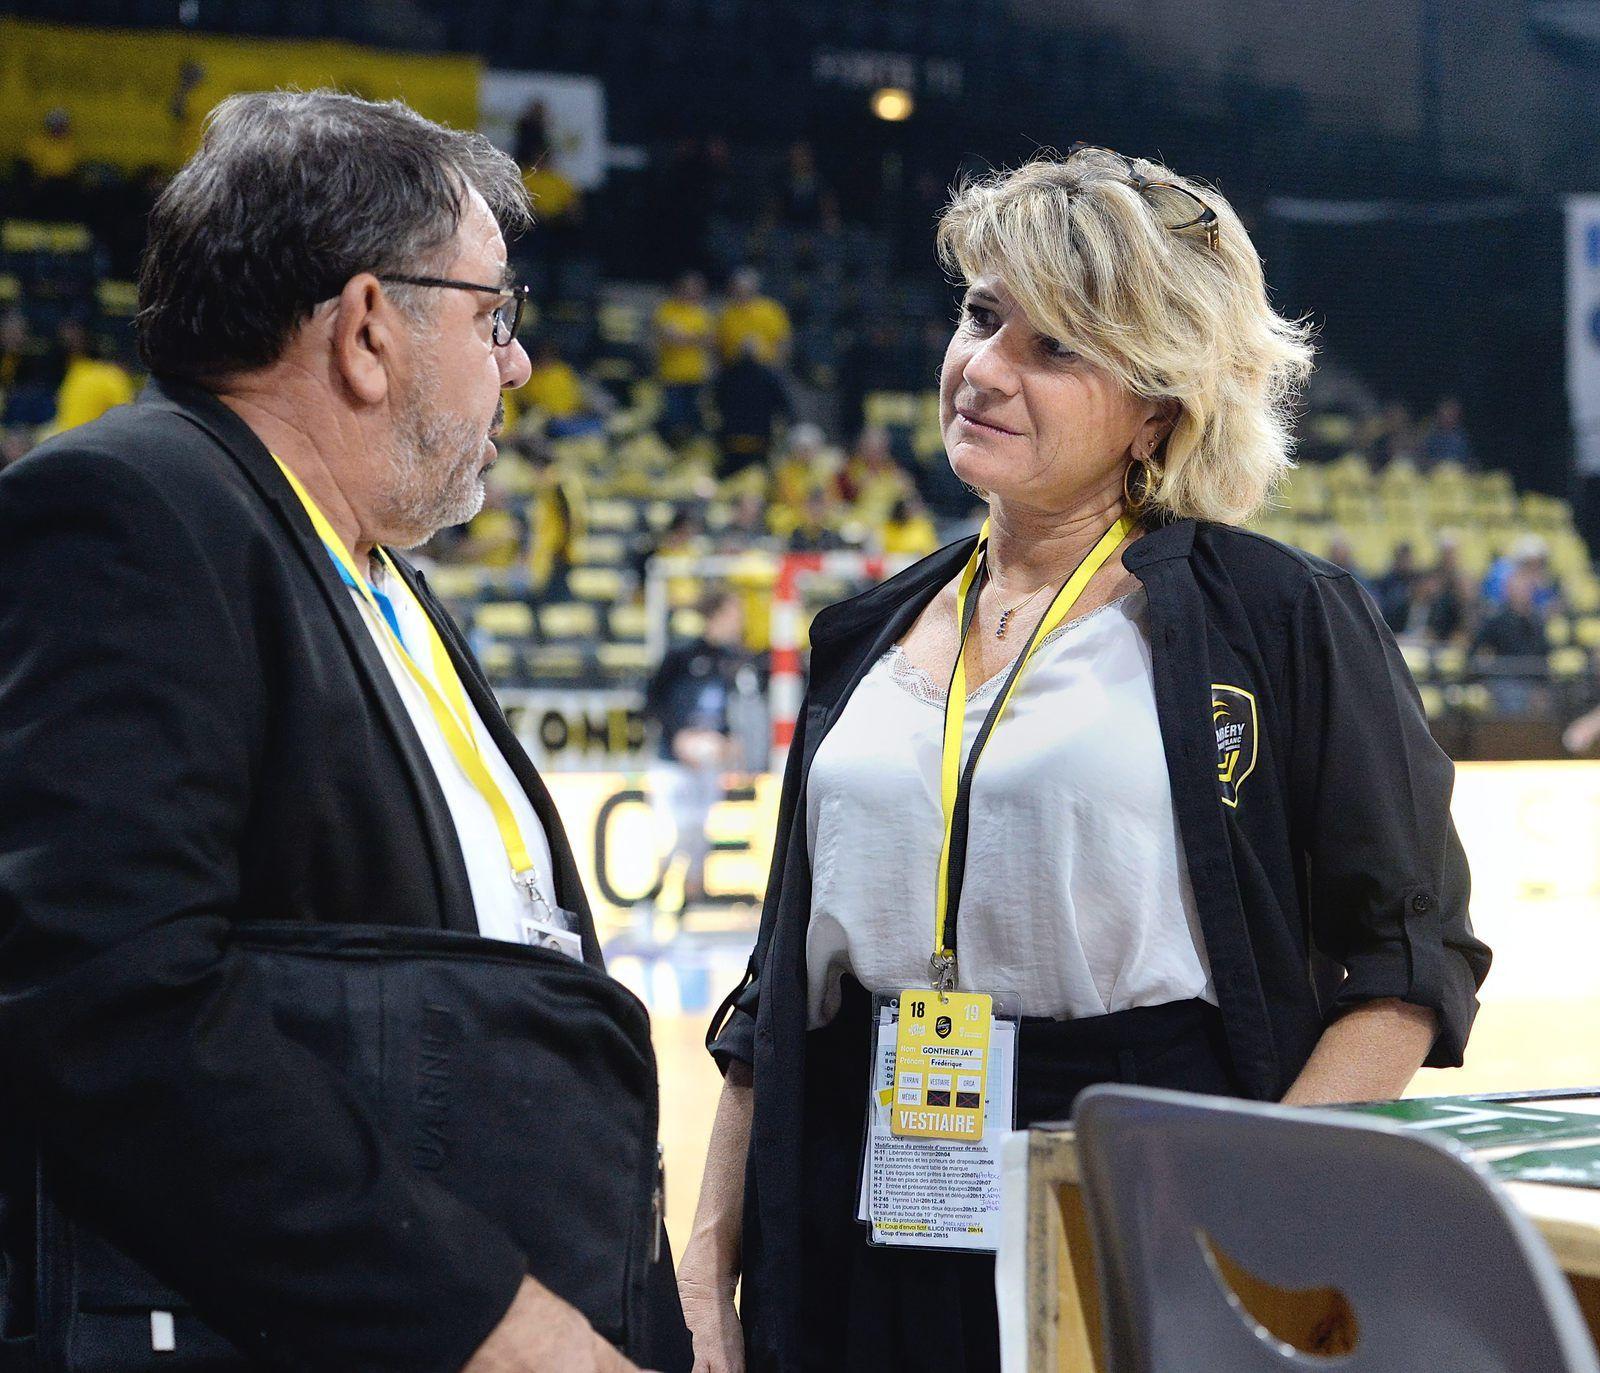 LSL CHAMBERY : 24 - IVRY : 23 les photos du match 14 novembre 2018